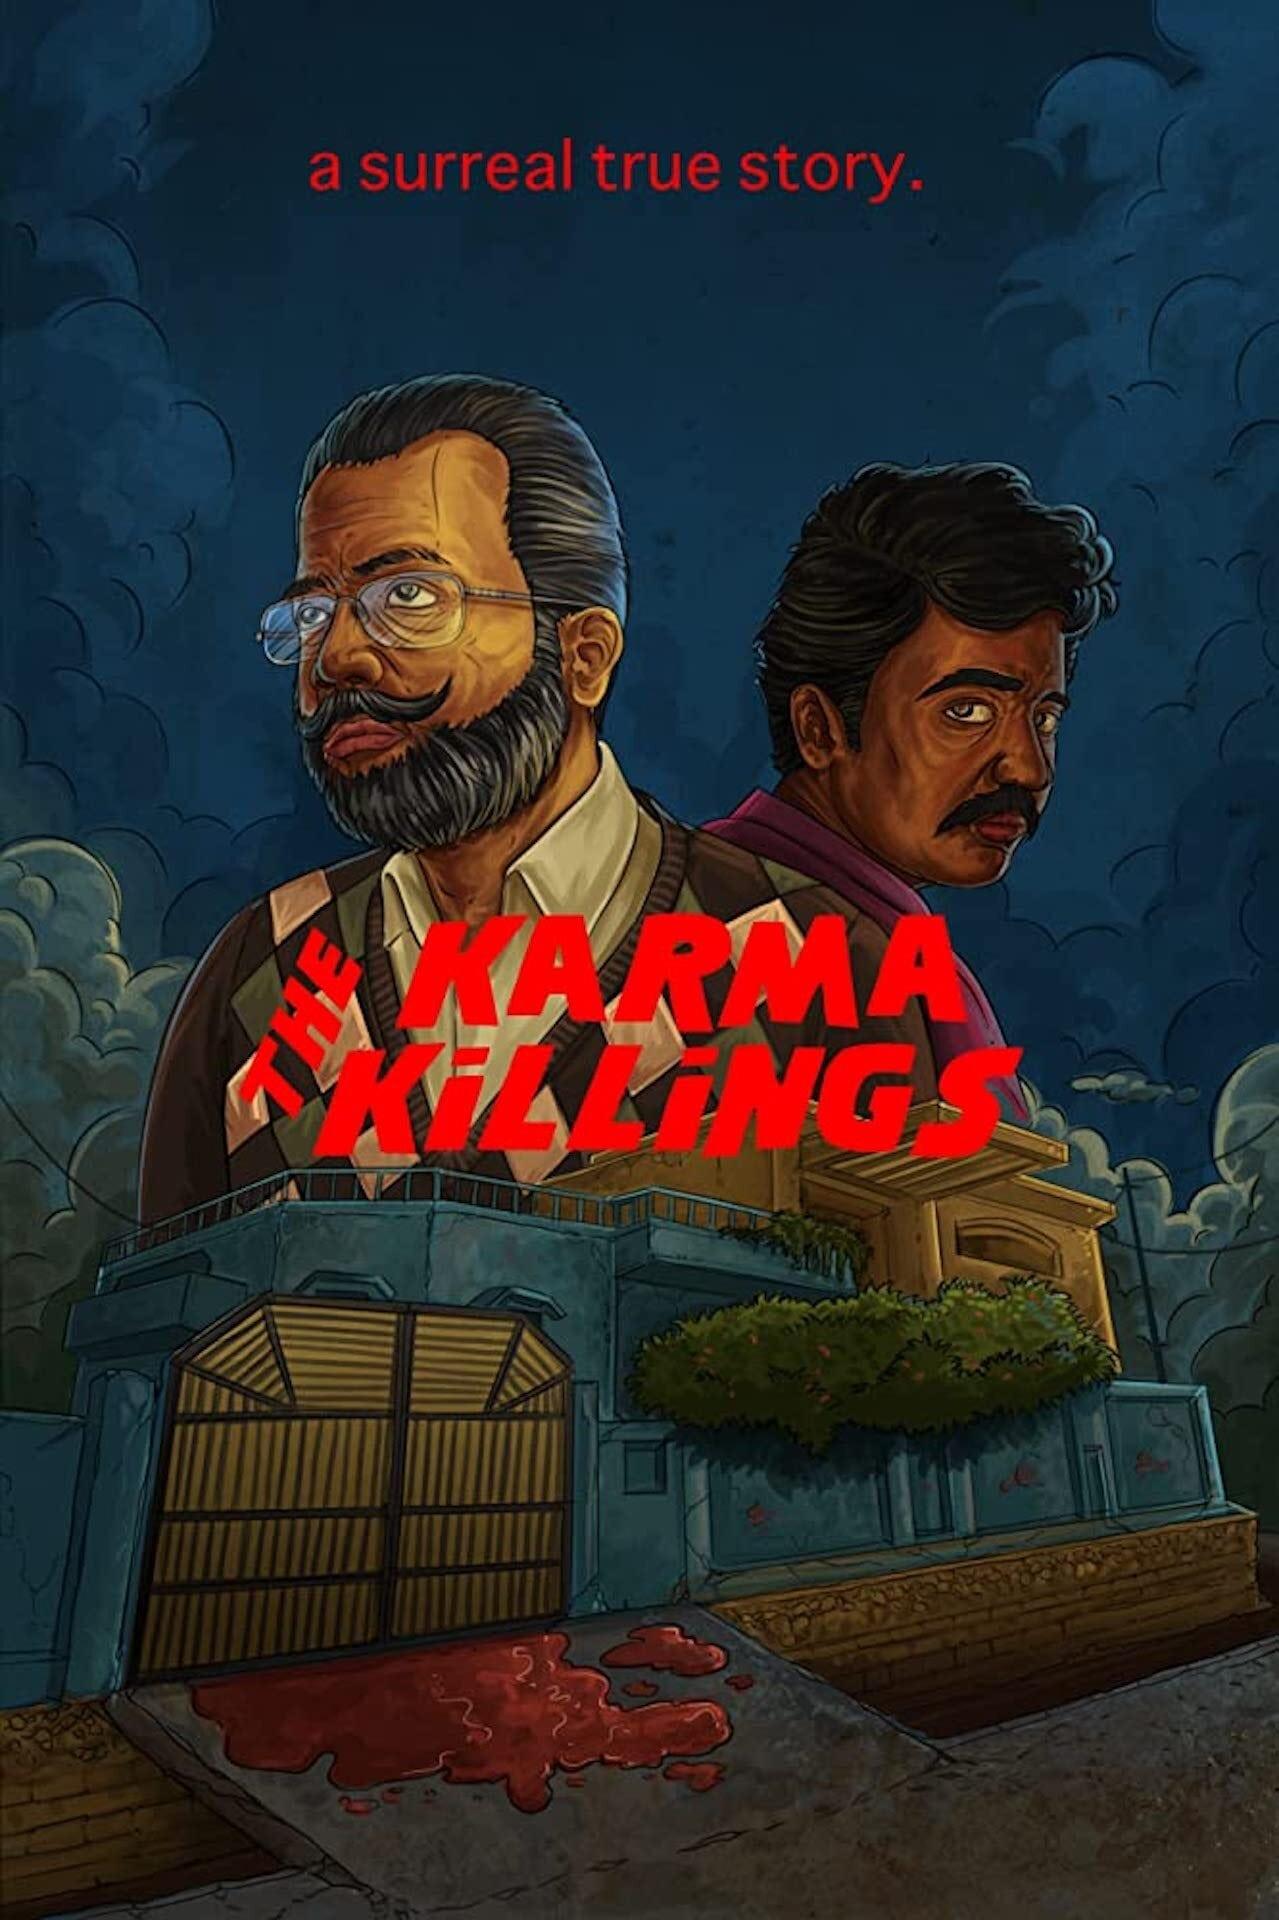 The Karma Killings